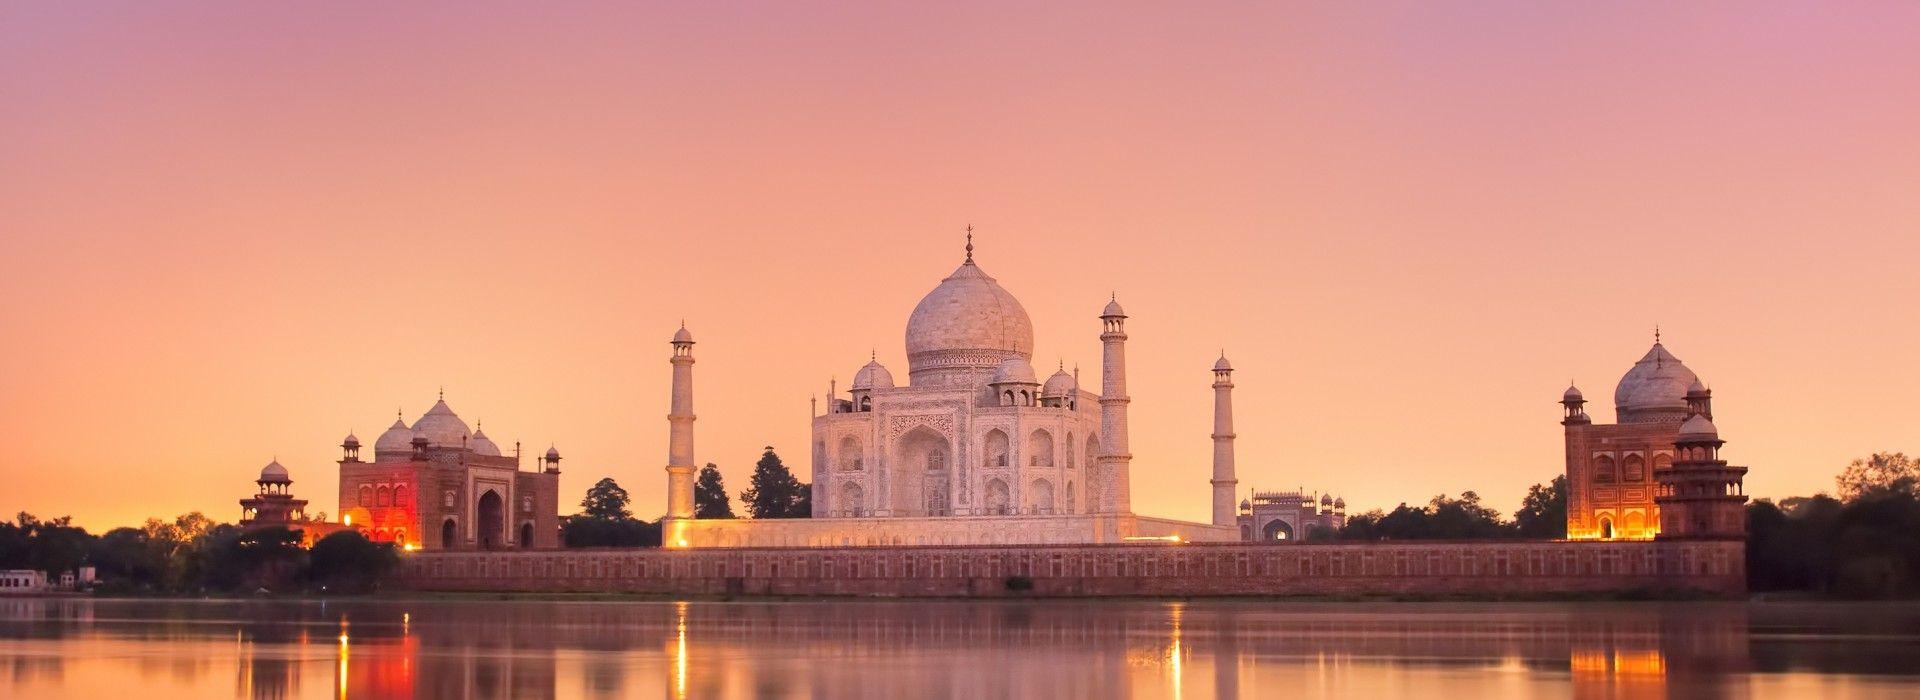 Mountains Tours in Delhi & Golden Triangle